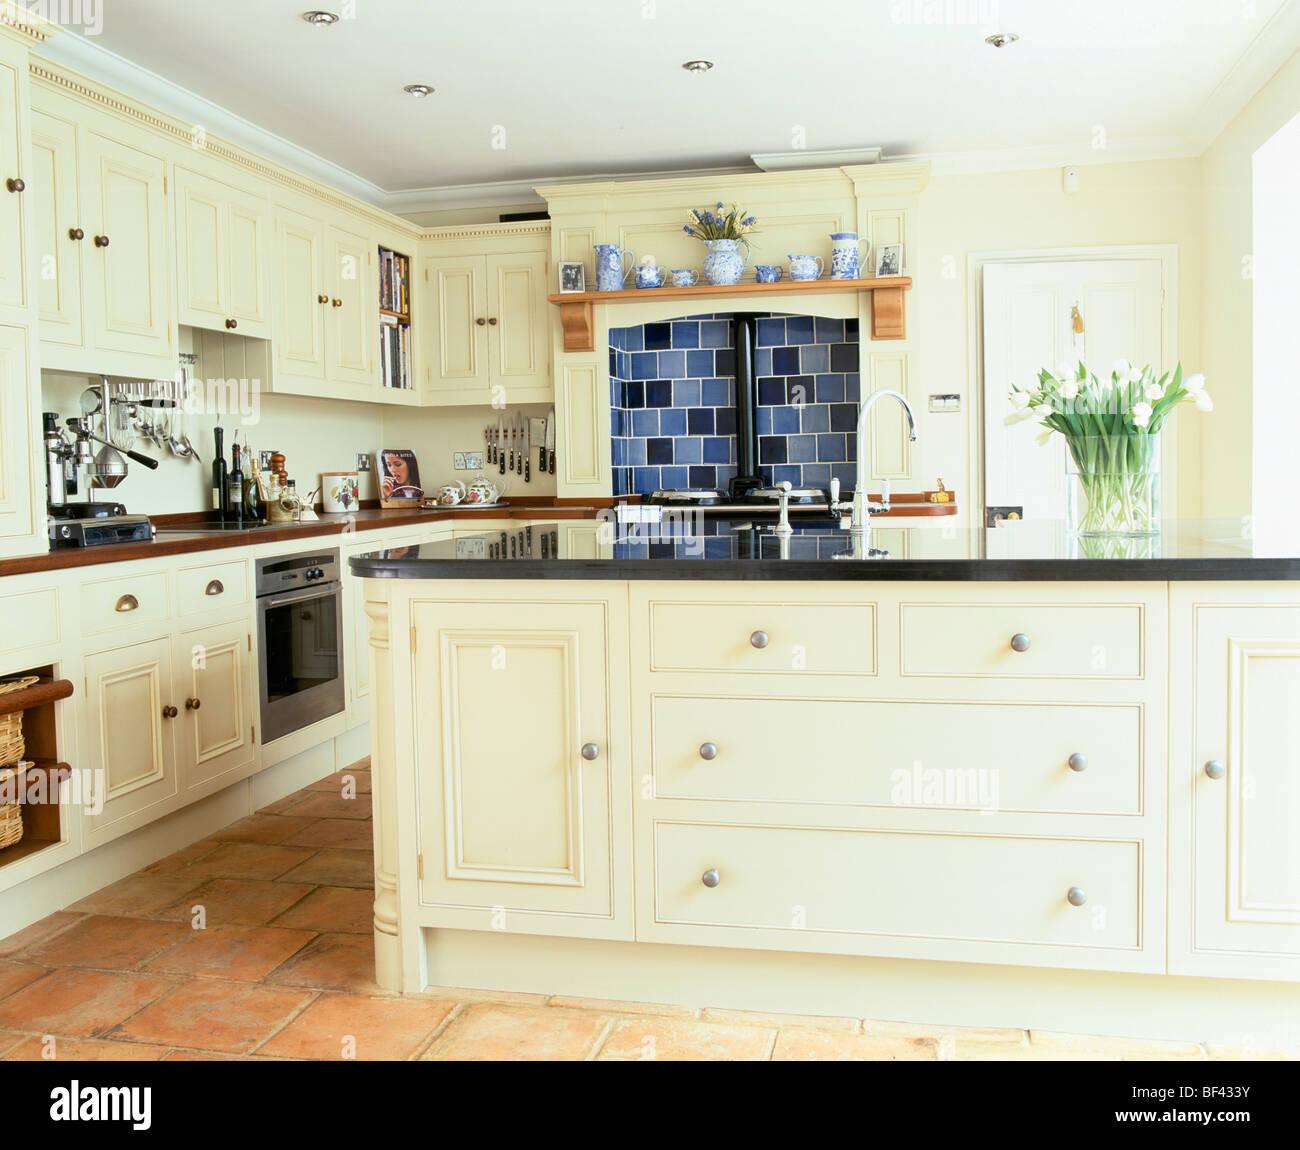 Interiors Traditional Kitchens Island Units Imágenes De Stock ...